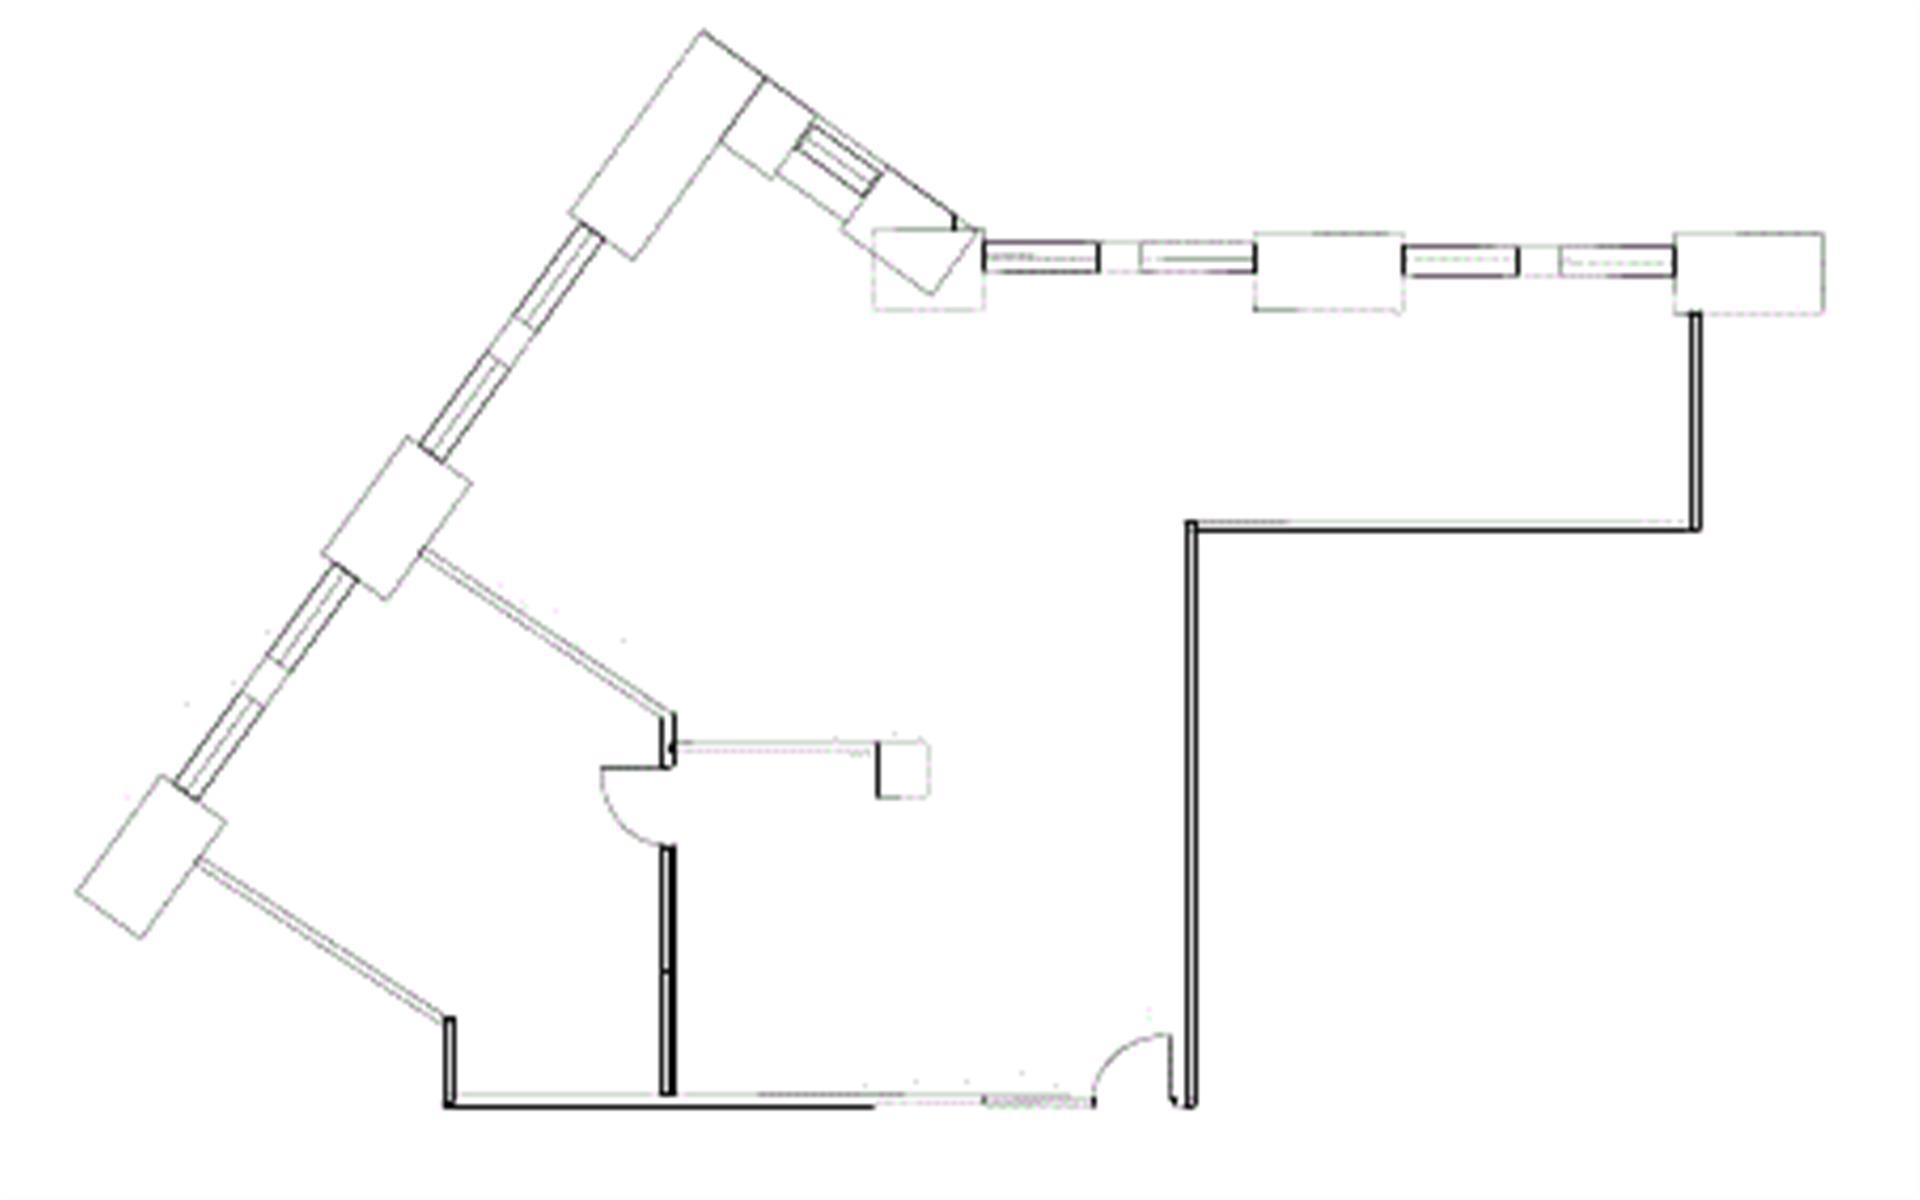 Boxer - The Hurt Building - Team Office | Suite 1440